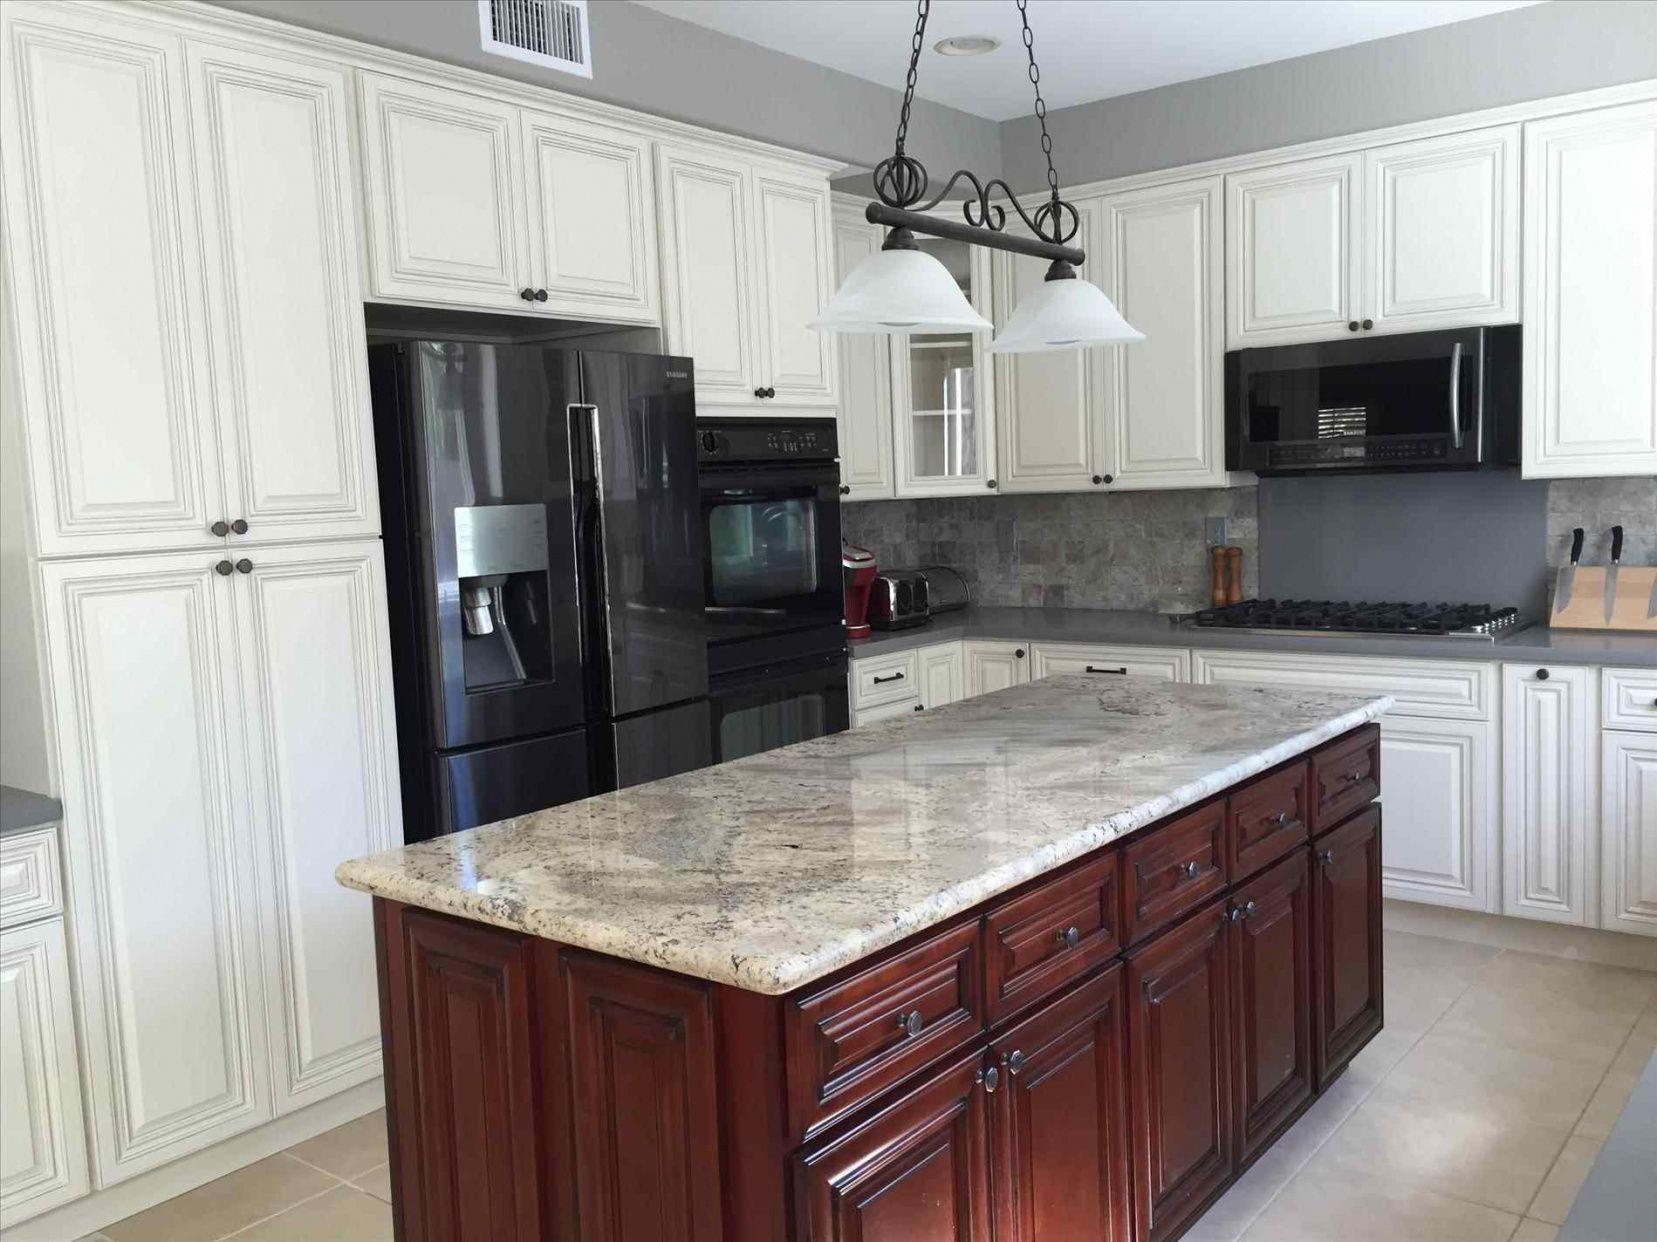 55 Quartz Countertops with White Cabinets